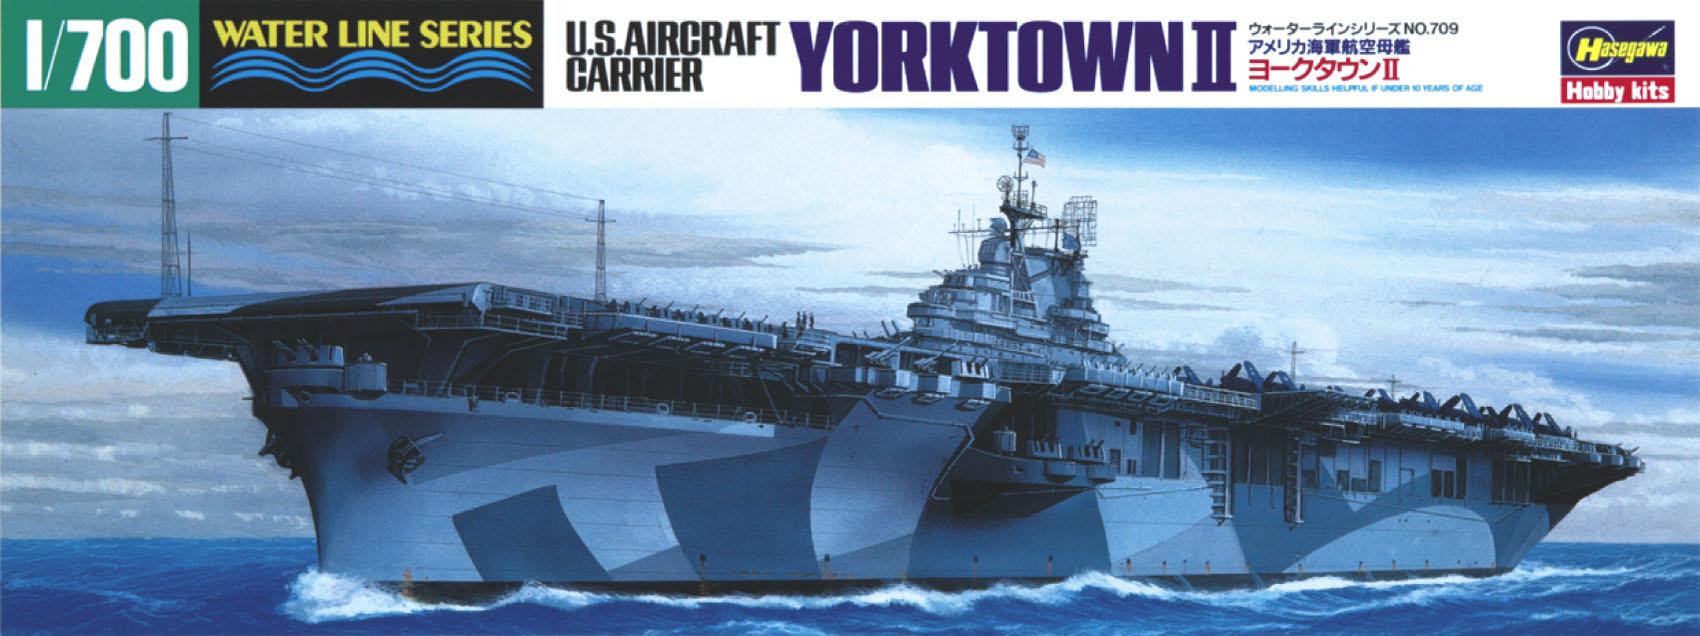 Hasegawa U.S. Aircraft Carrier Yorktown Ii